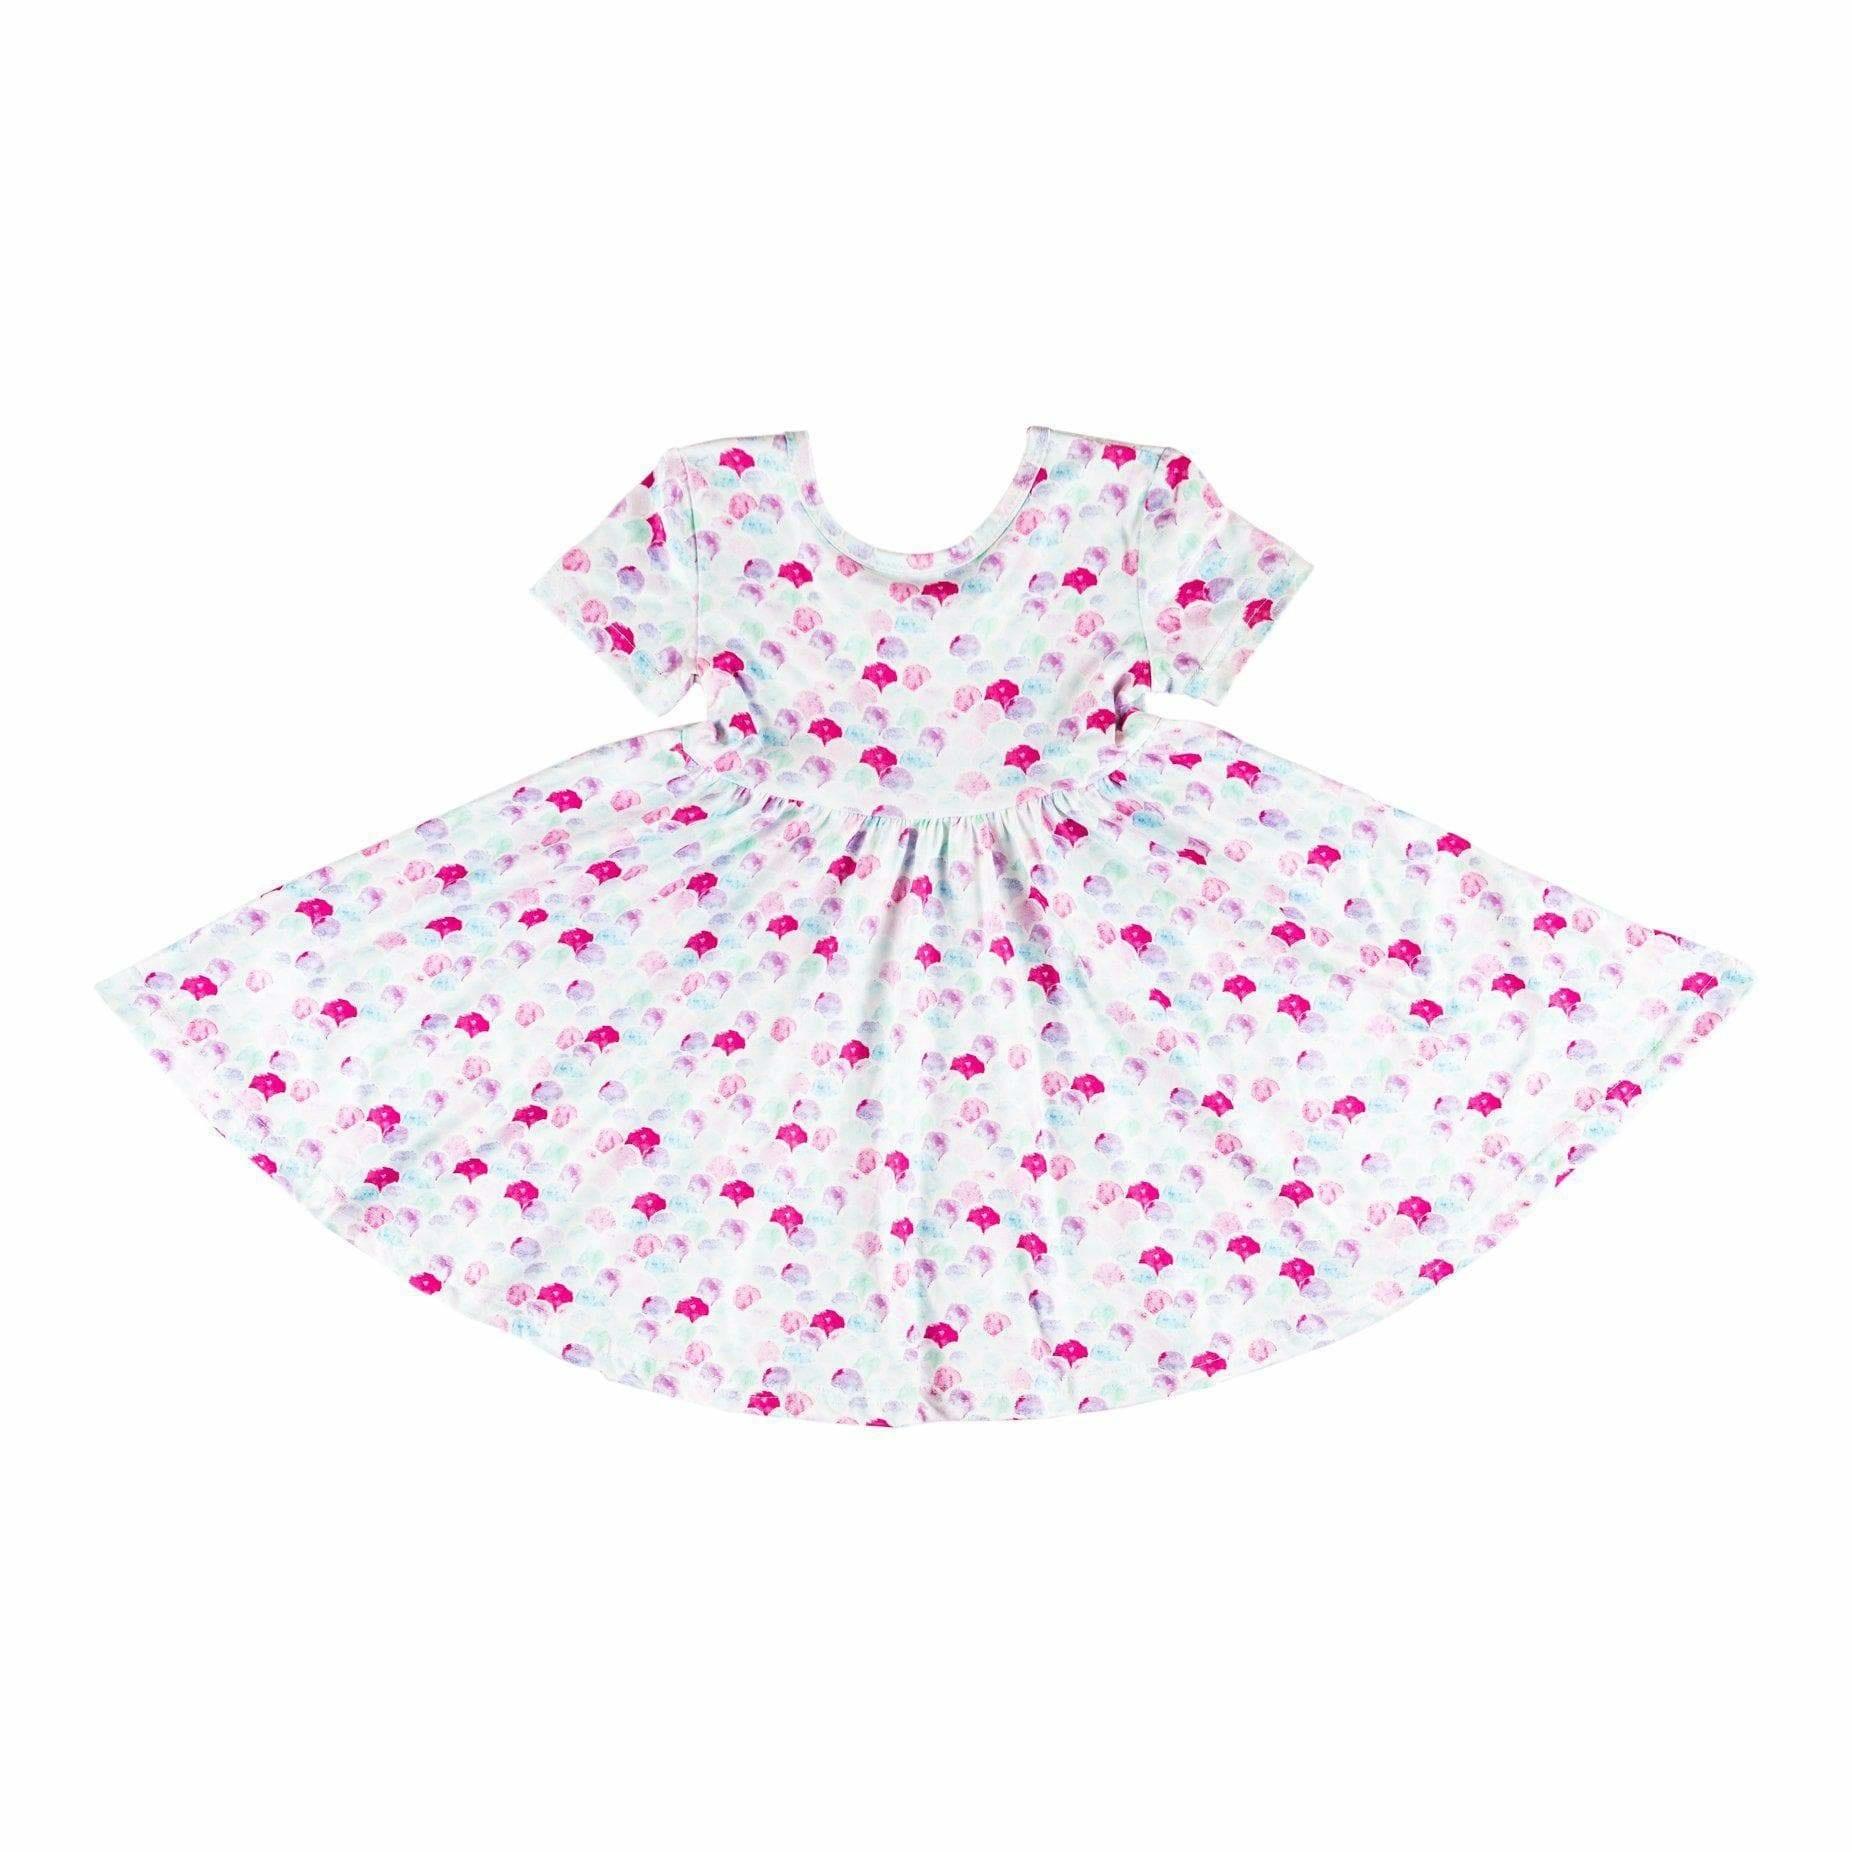 Mila & Rose Mermaid Scales SS Twirl Dress